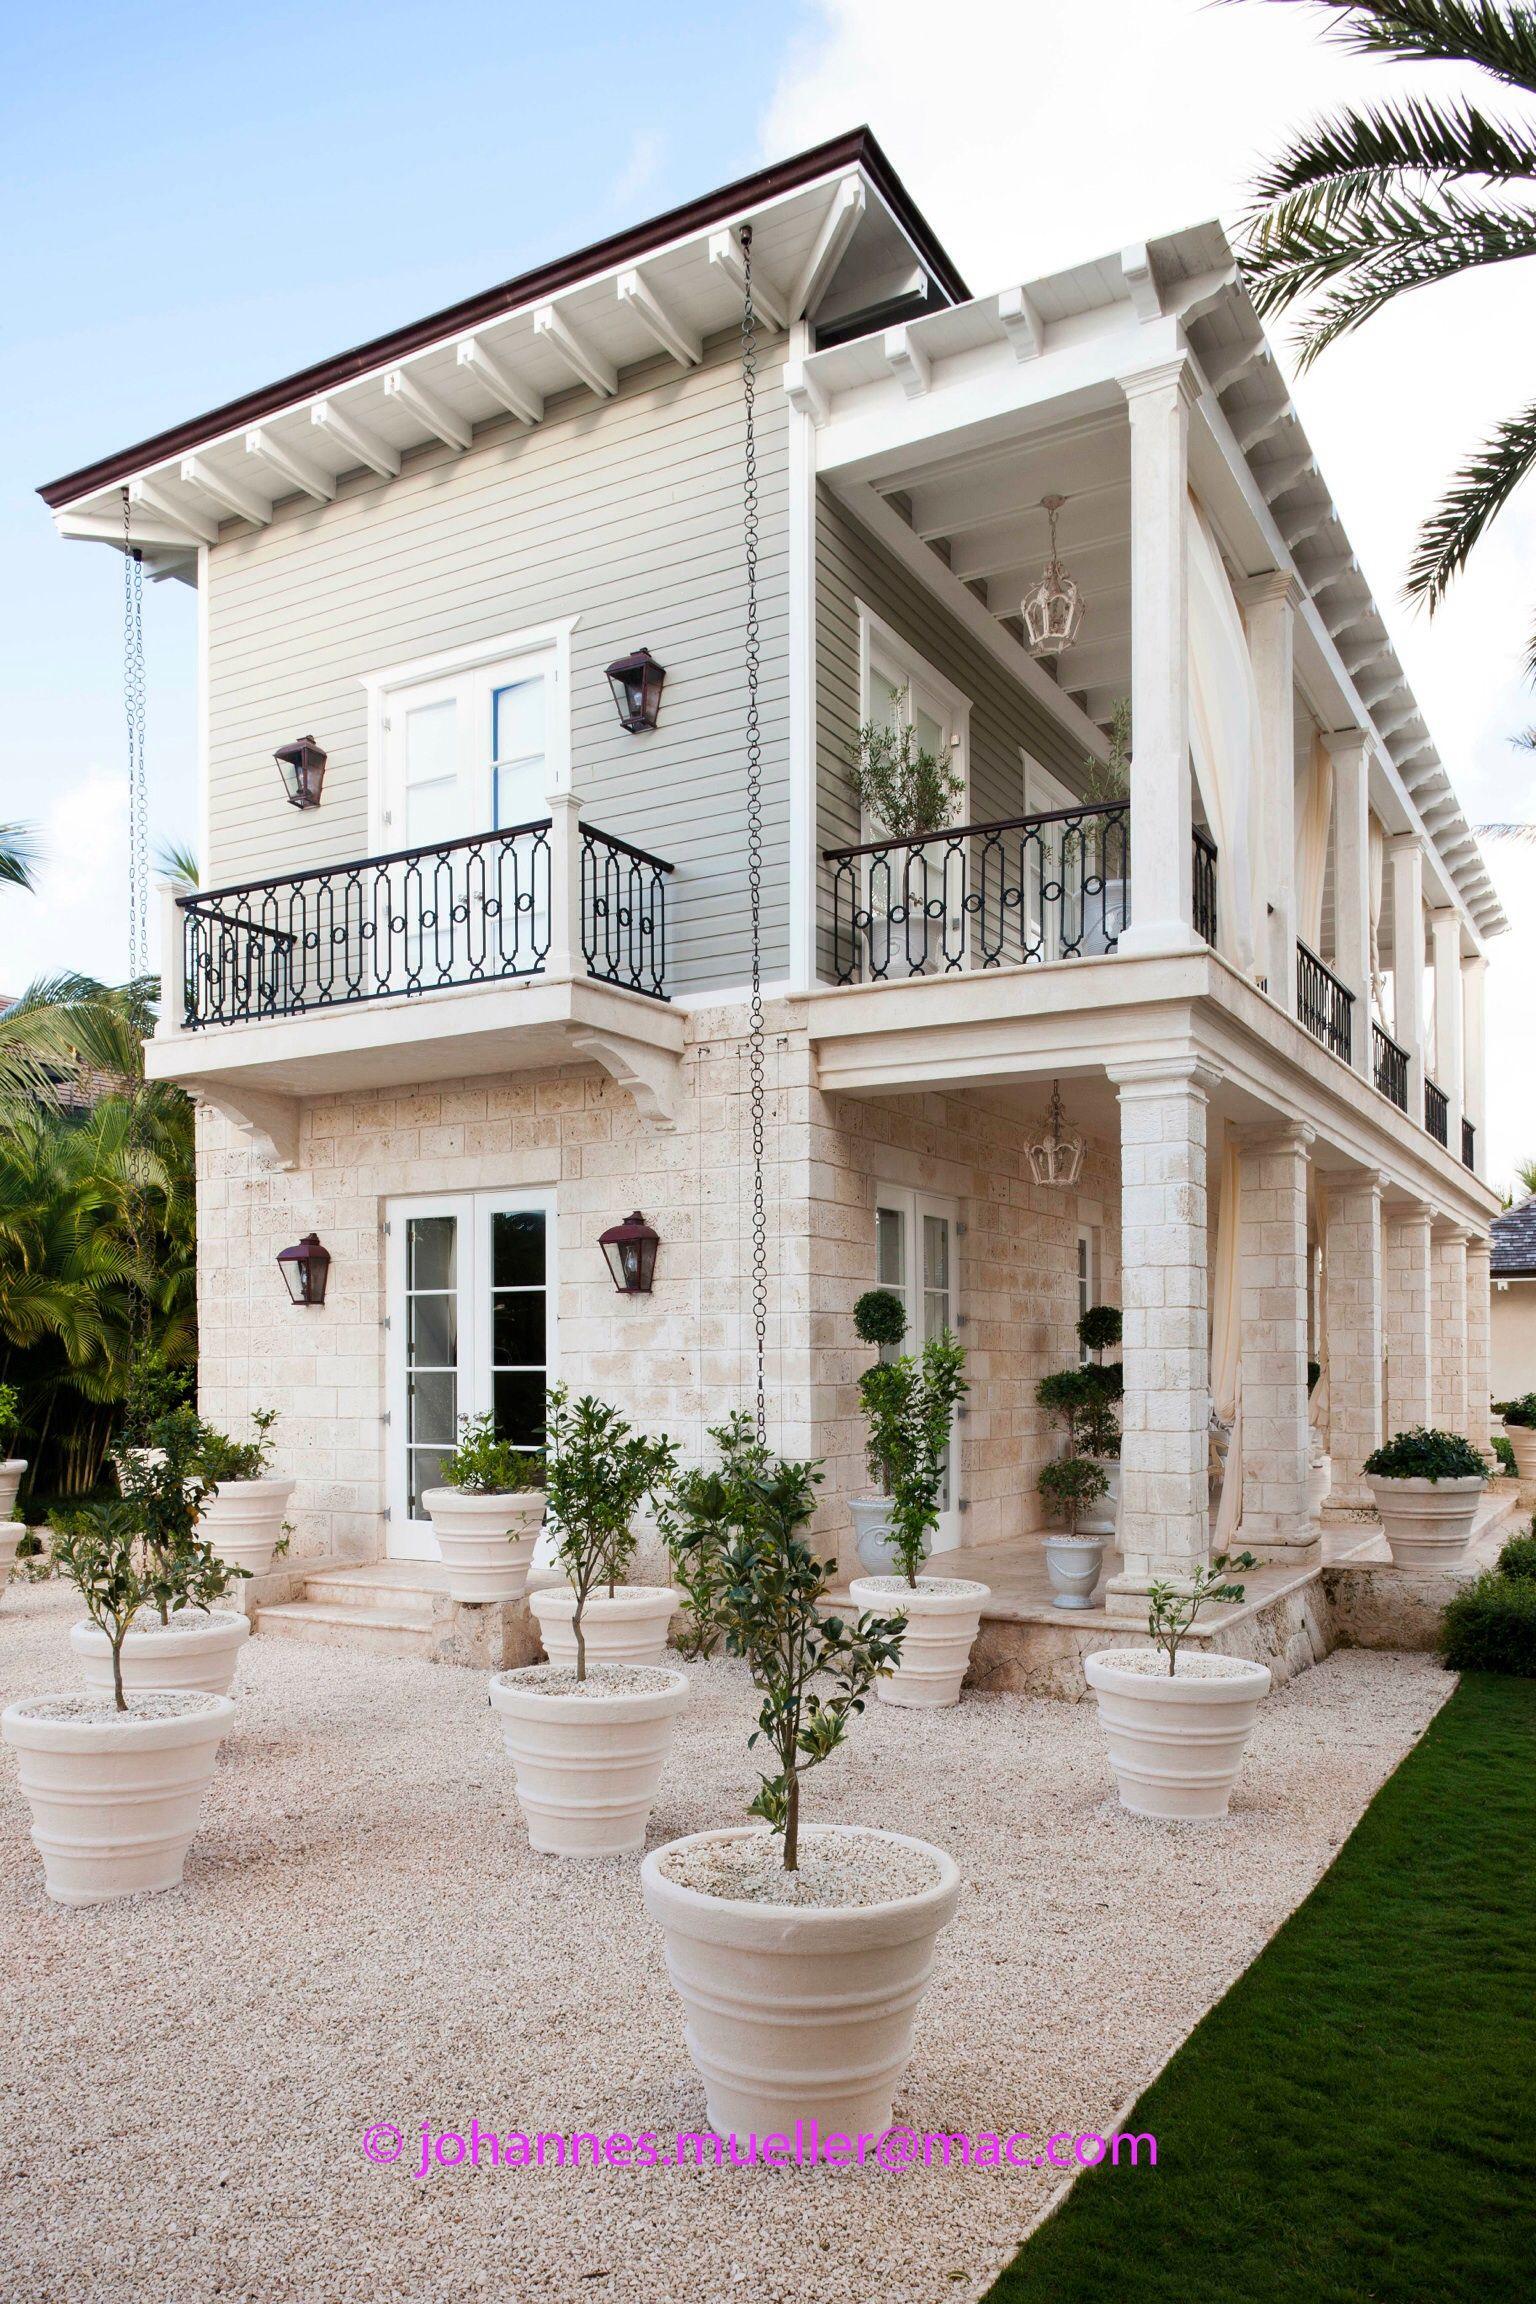 Villa bianca interior designer decoretor monicadamonte www.monicadamonte.com